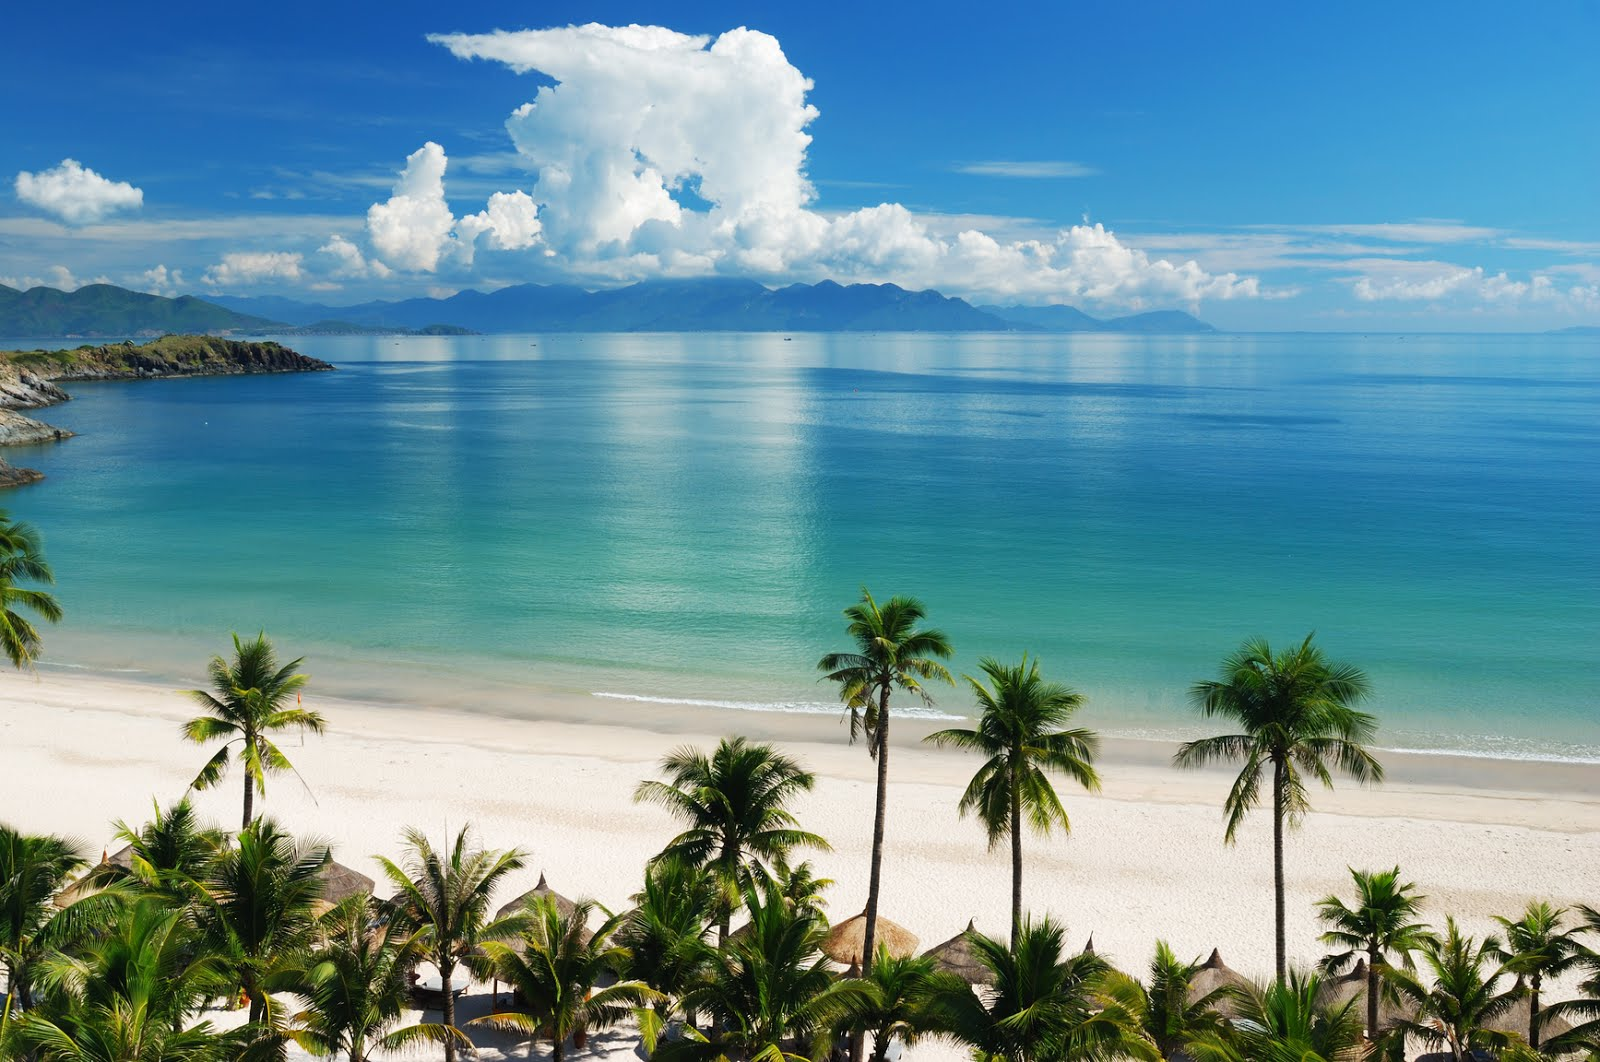 http://1.bp.blogspot.com/-Qdqu3QDVfvw/UP_kyADPPBI/AAAAAAABjK0/z8DOhOdmAxM/s1600/playa-de-aguas-cristalinas-palmeras-y-arenas-blancas-exotic-beach-playa-paradisiaca.jpg